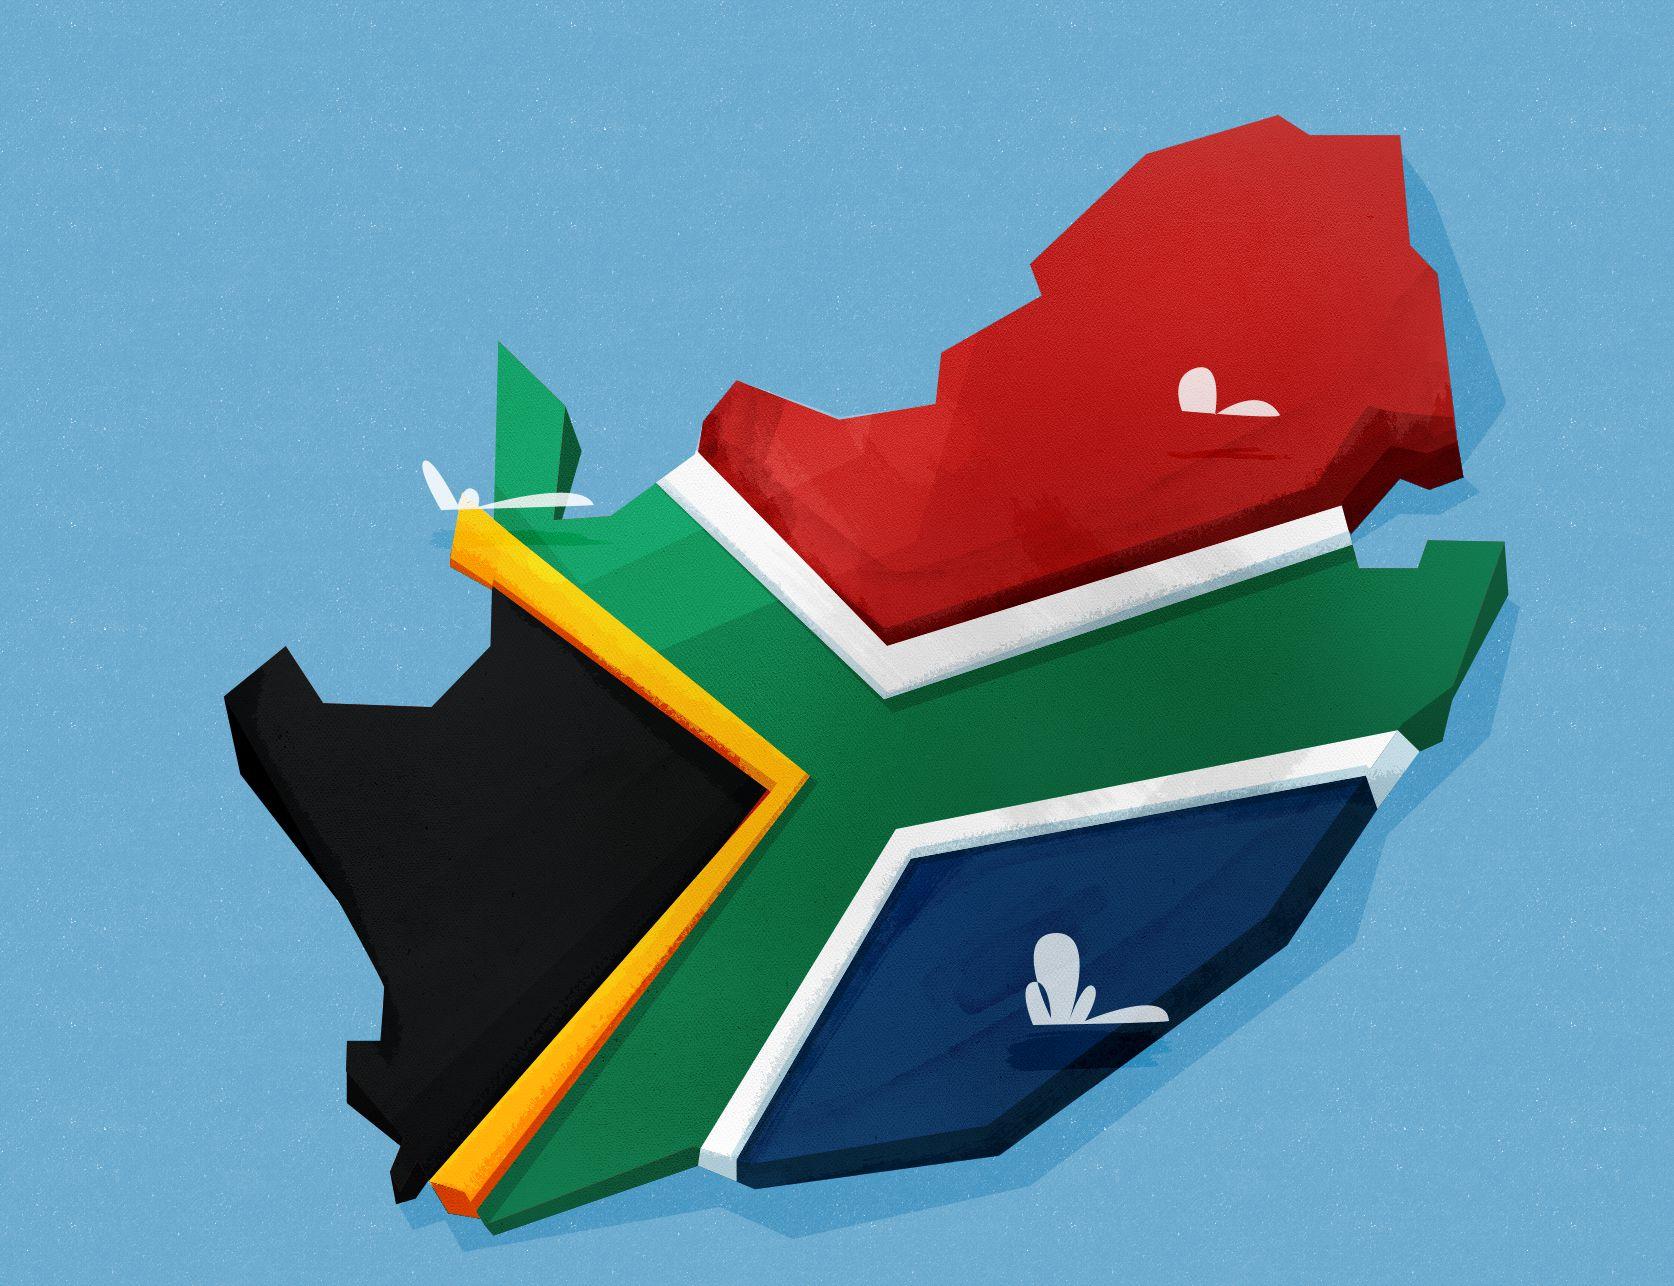 southafrica@2x.jpg